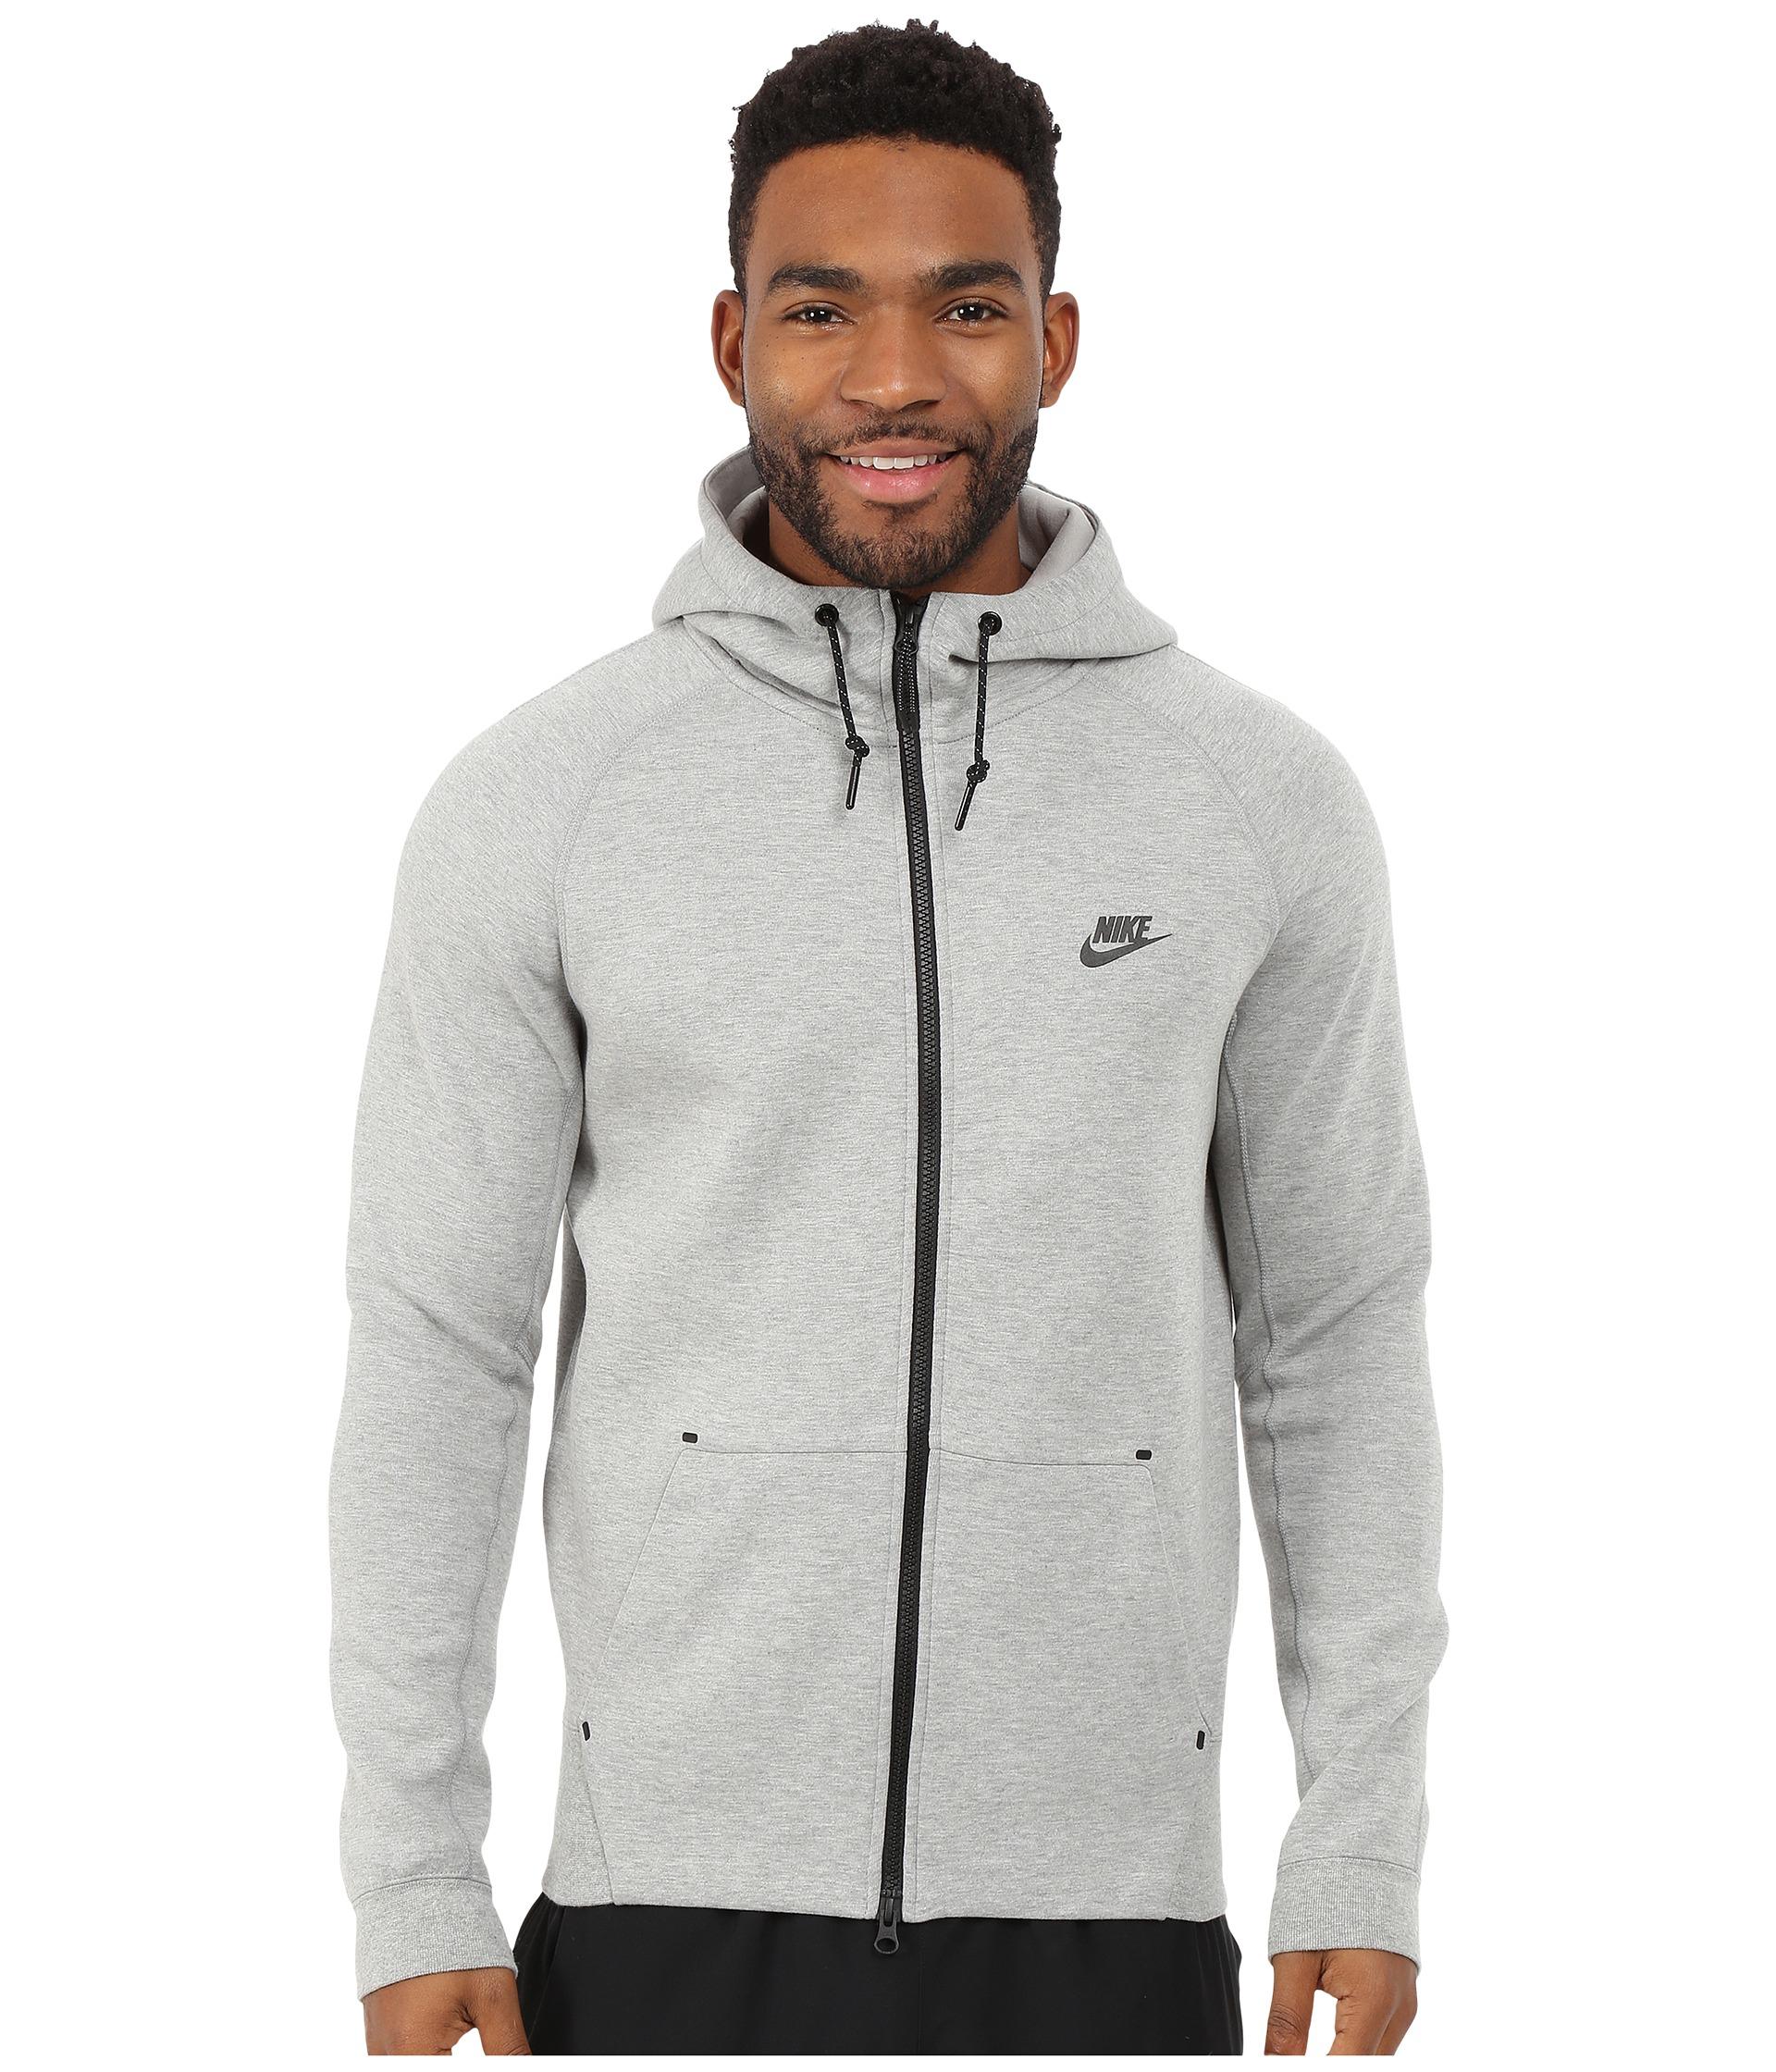 nike fleece zipper hoodie